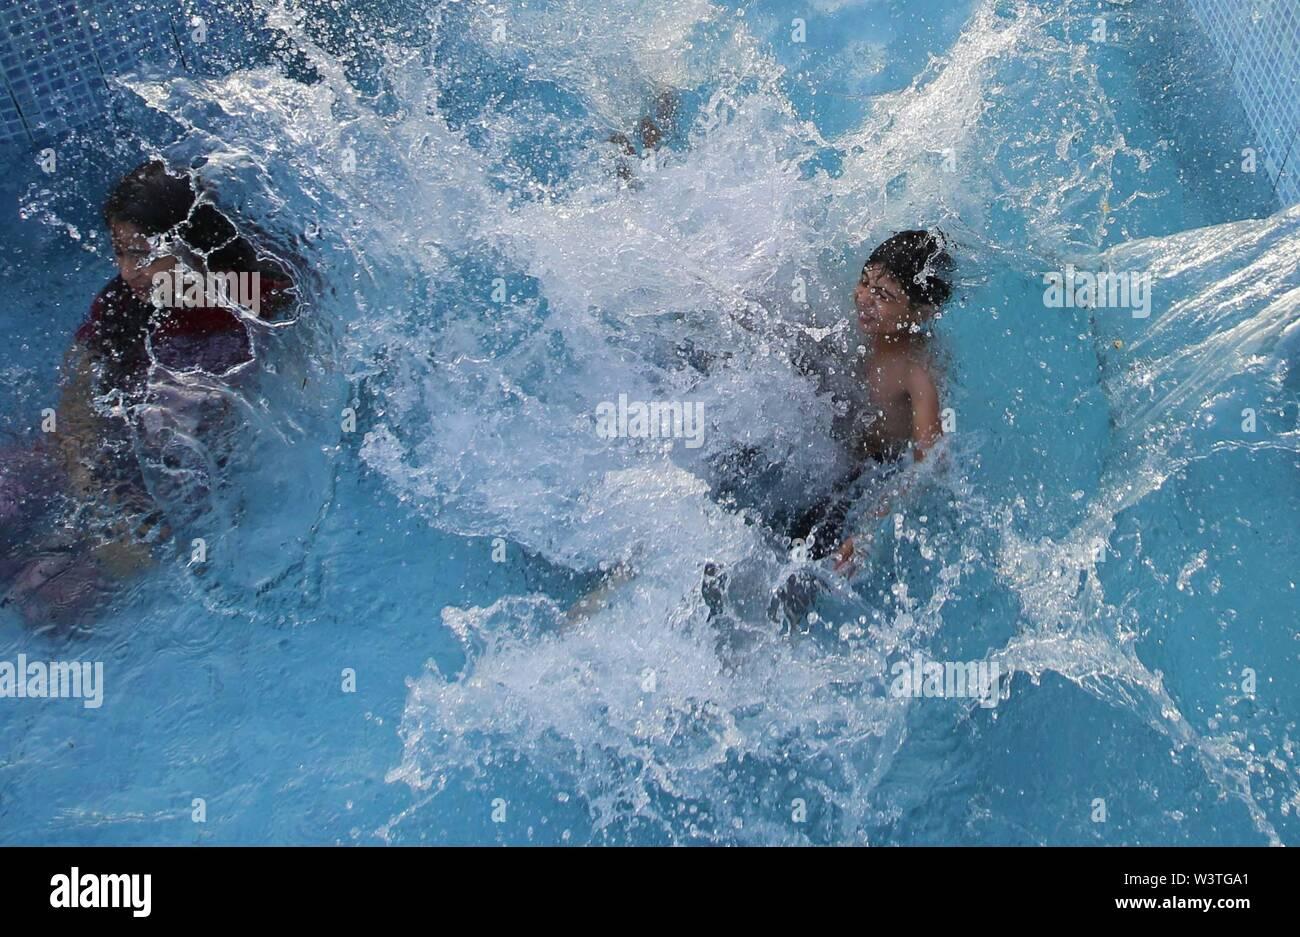 Gaza City, The Gaza Strip, Palestine. 17th July, 2019. Palestinian children play at a swimming pool on a hot day in the Gaza Strip. Credit: Hassan Jedi/Quds Net News/ZUMA Wire/Alamy Live News - Stock Image